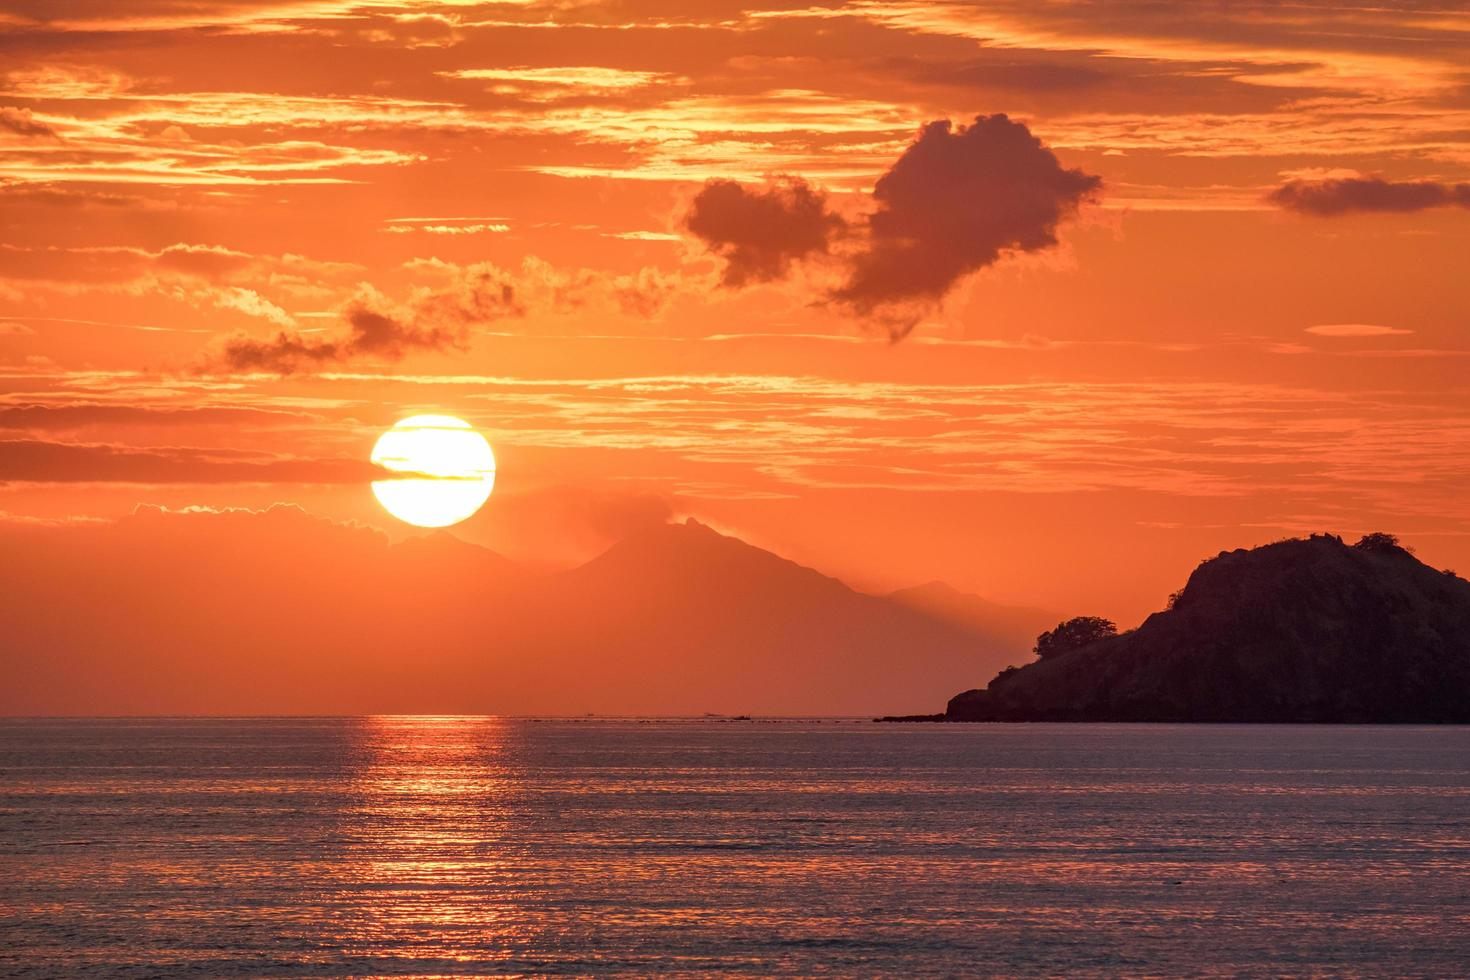 Beautiful golden orange sunset over the ocean. photo